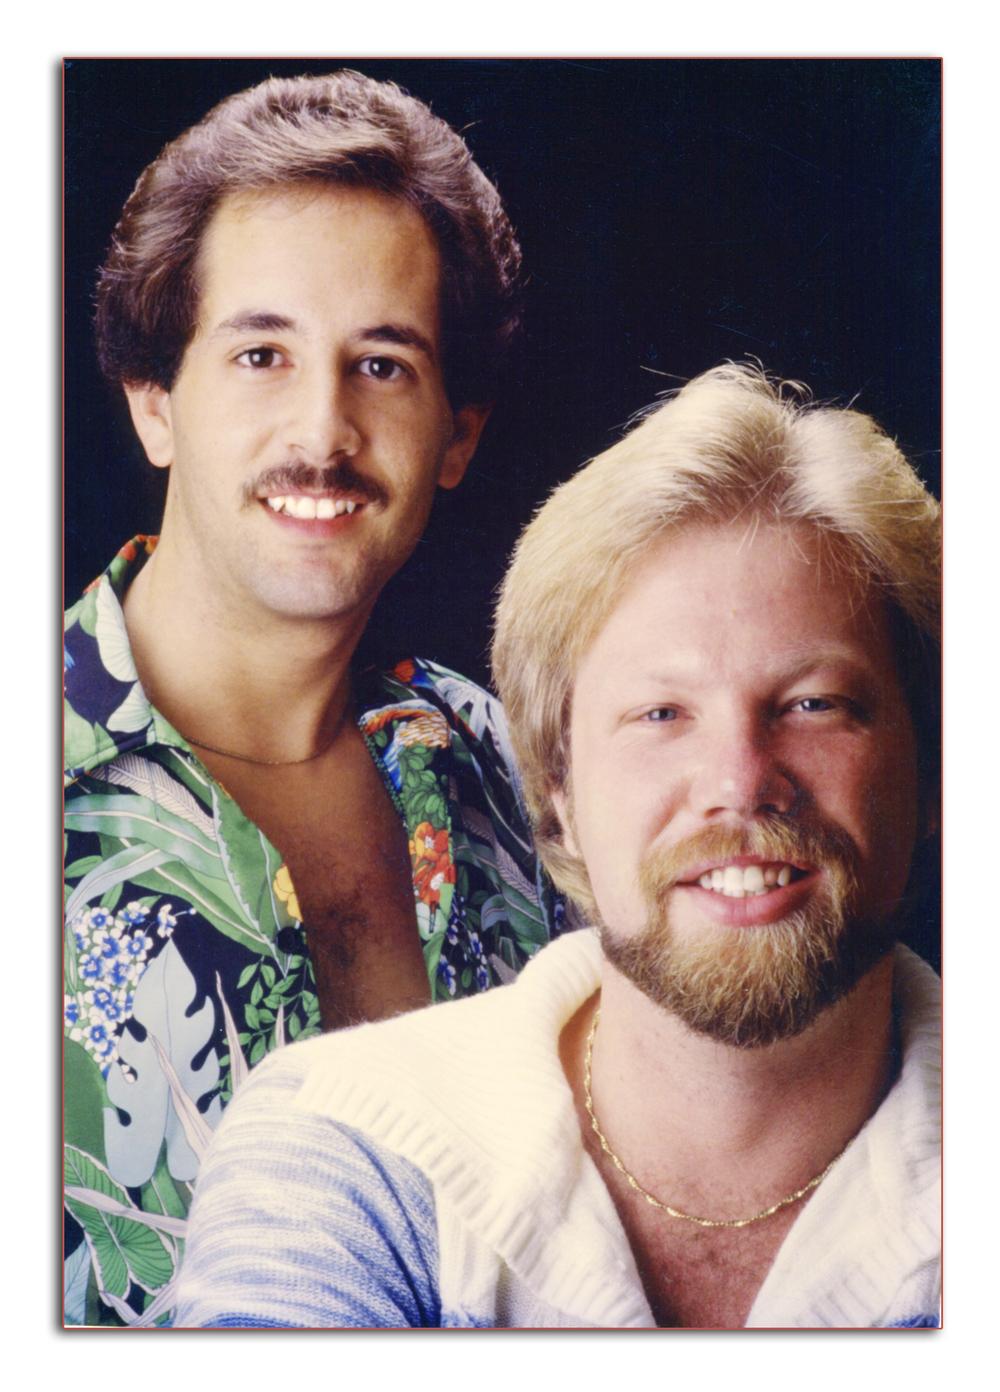 Tom and Darren. 1976.